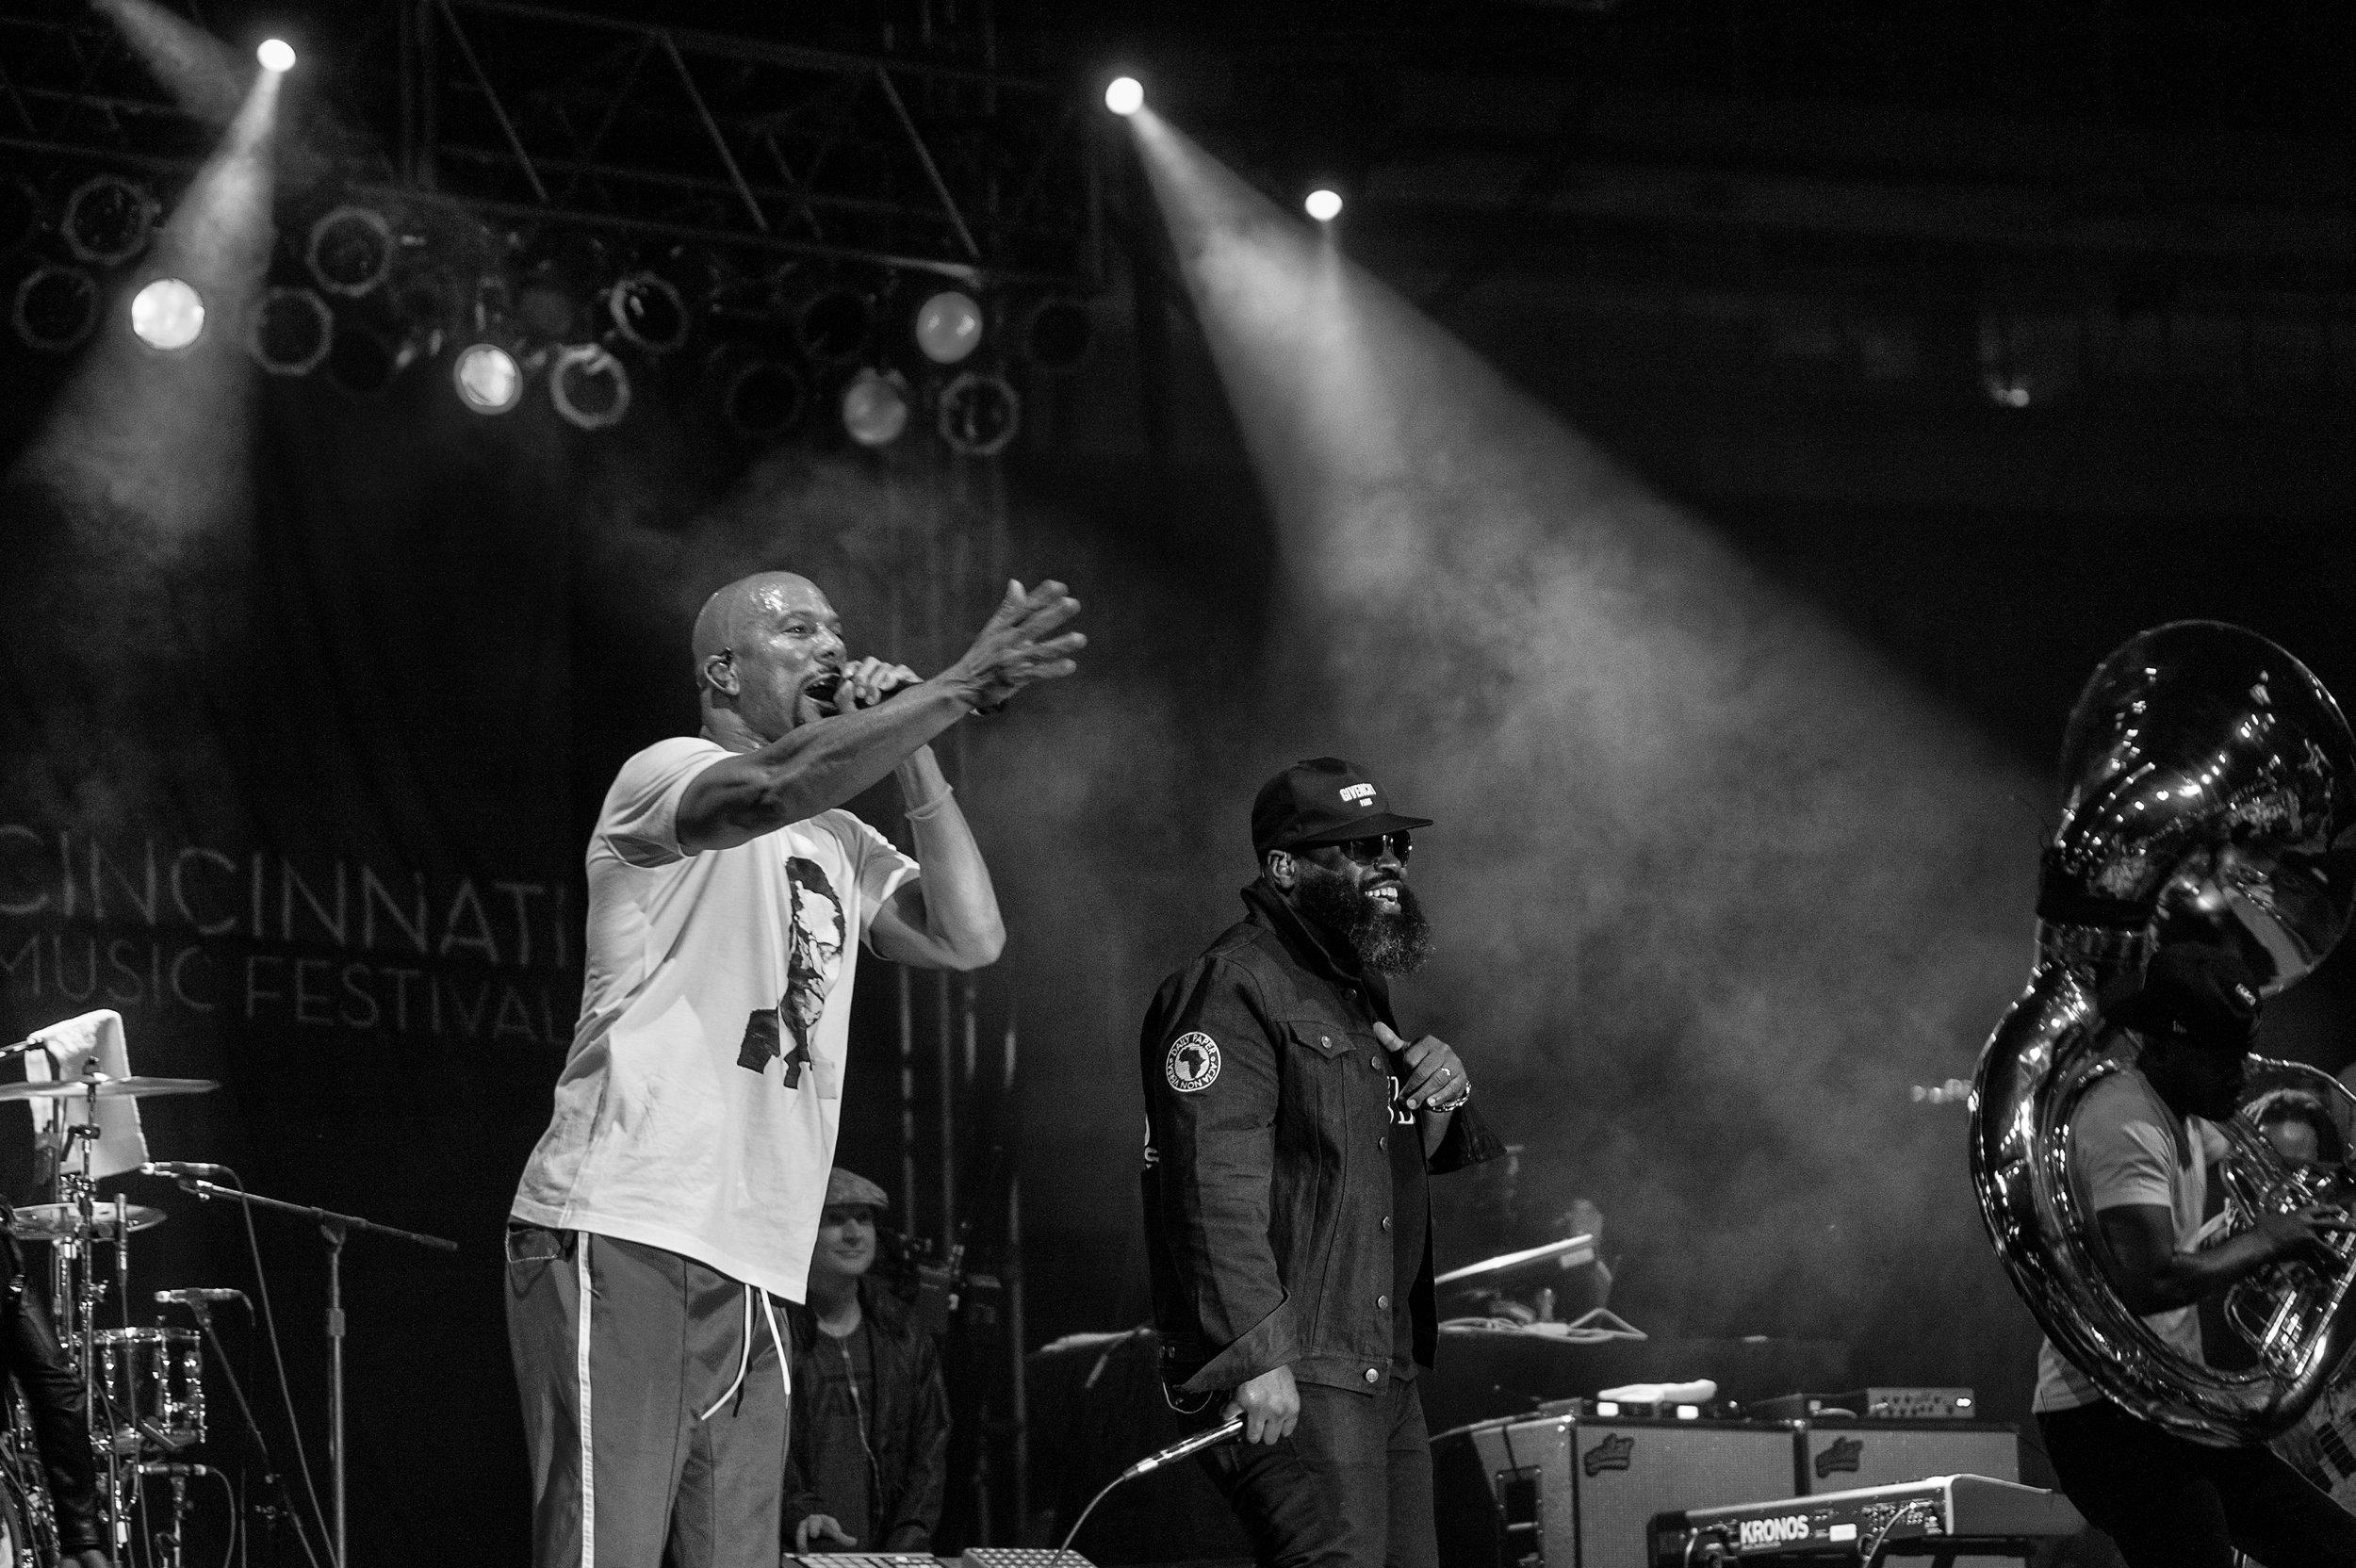 Cincy Music Fest-17.jpg